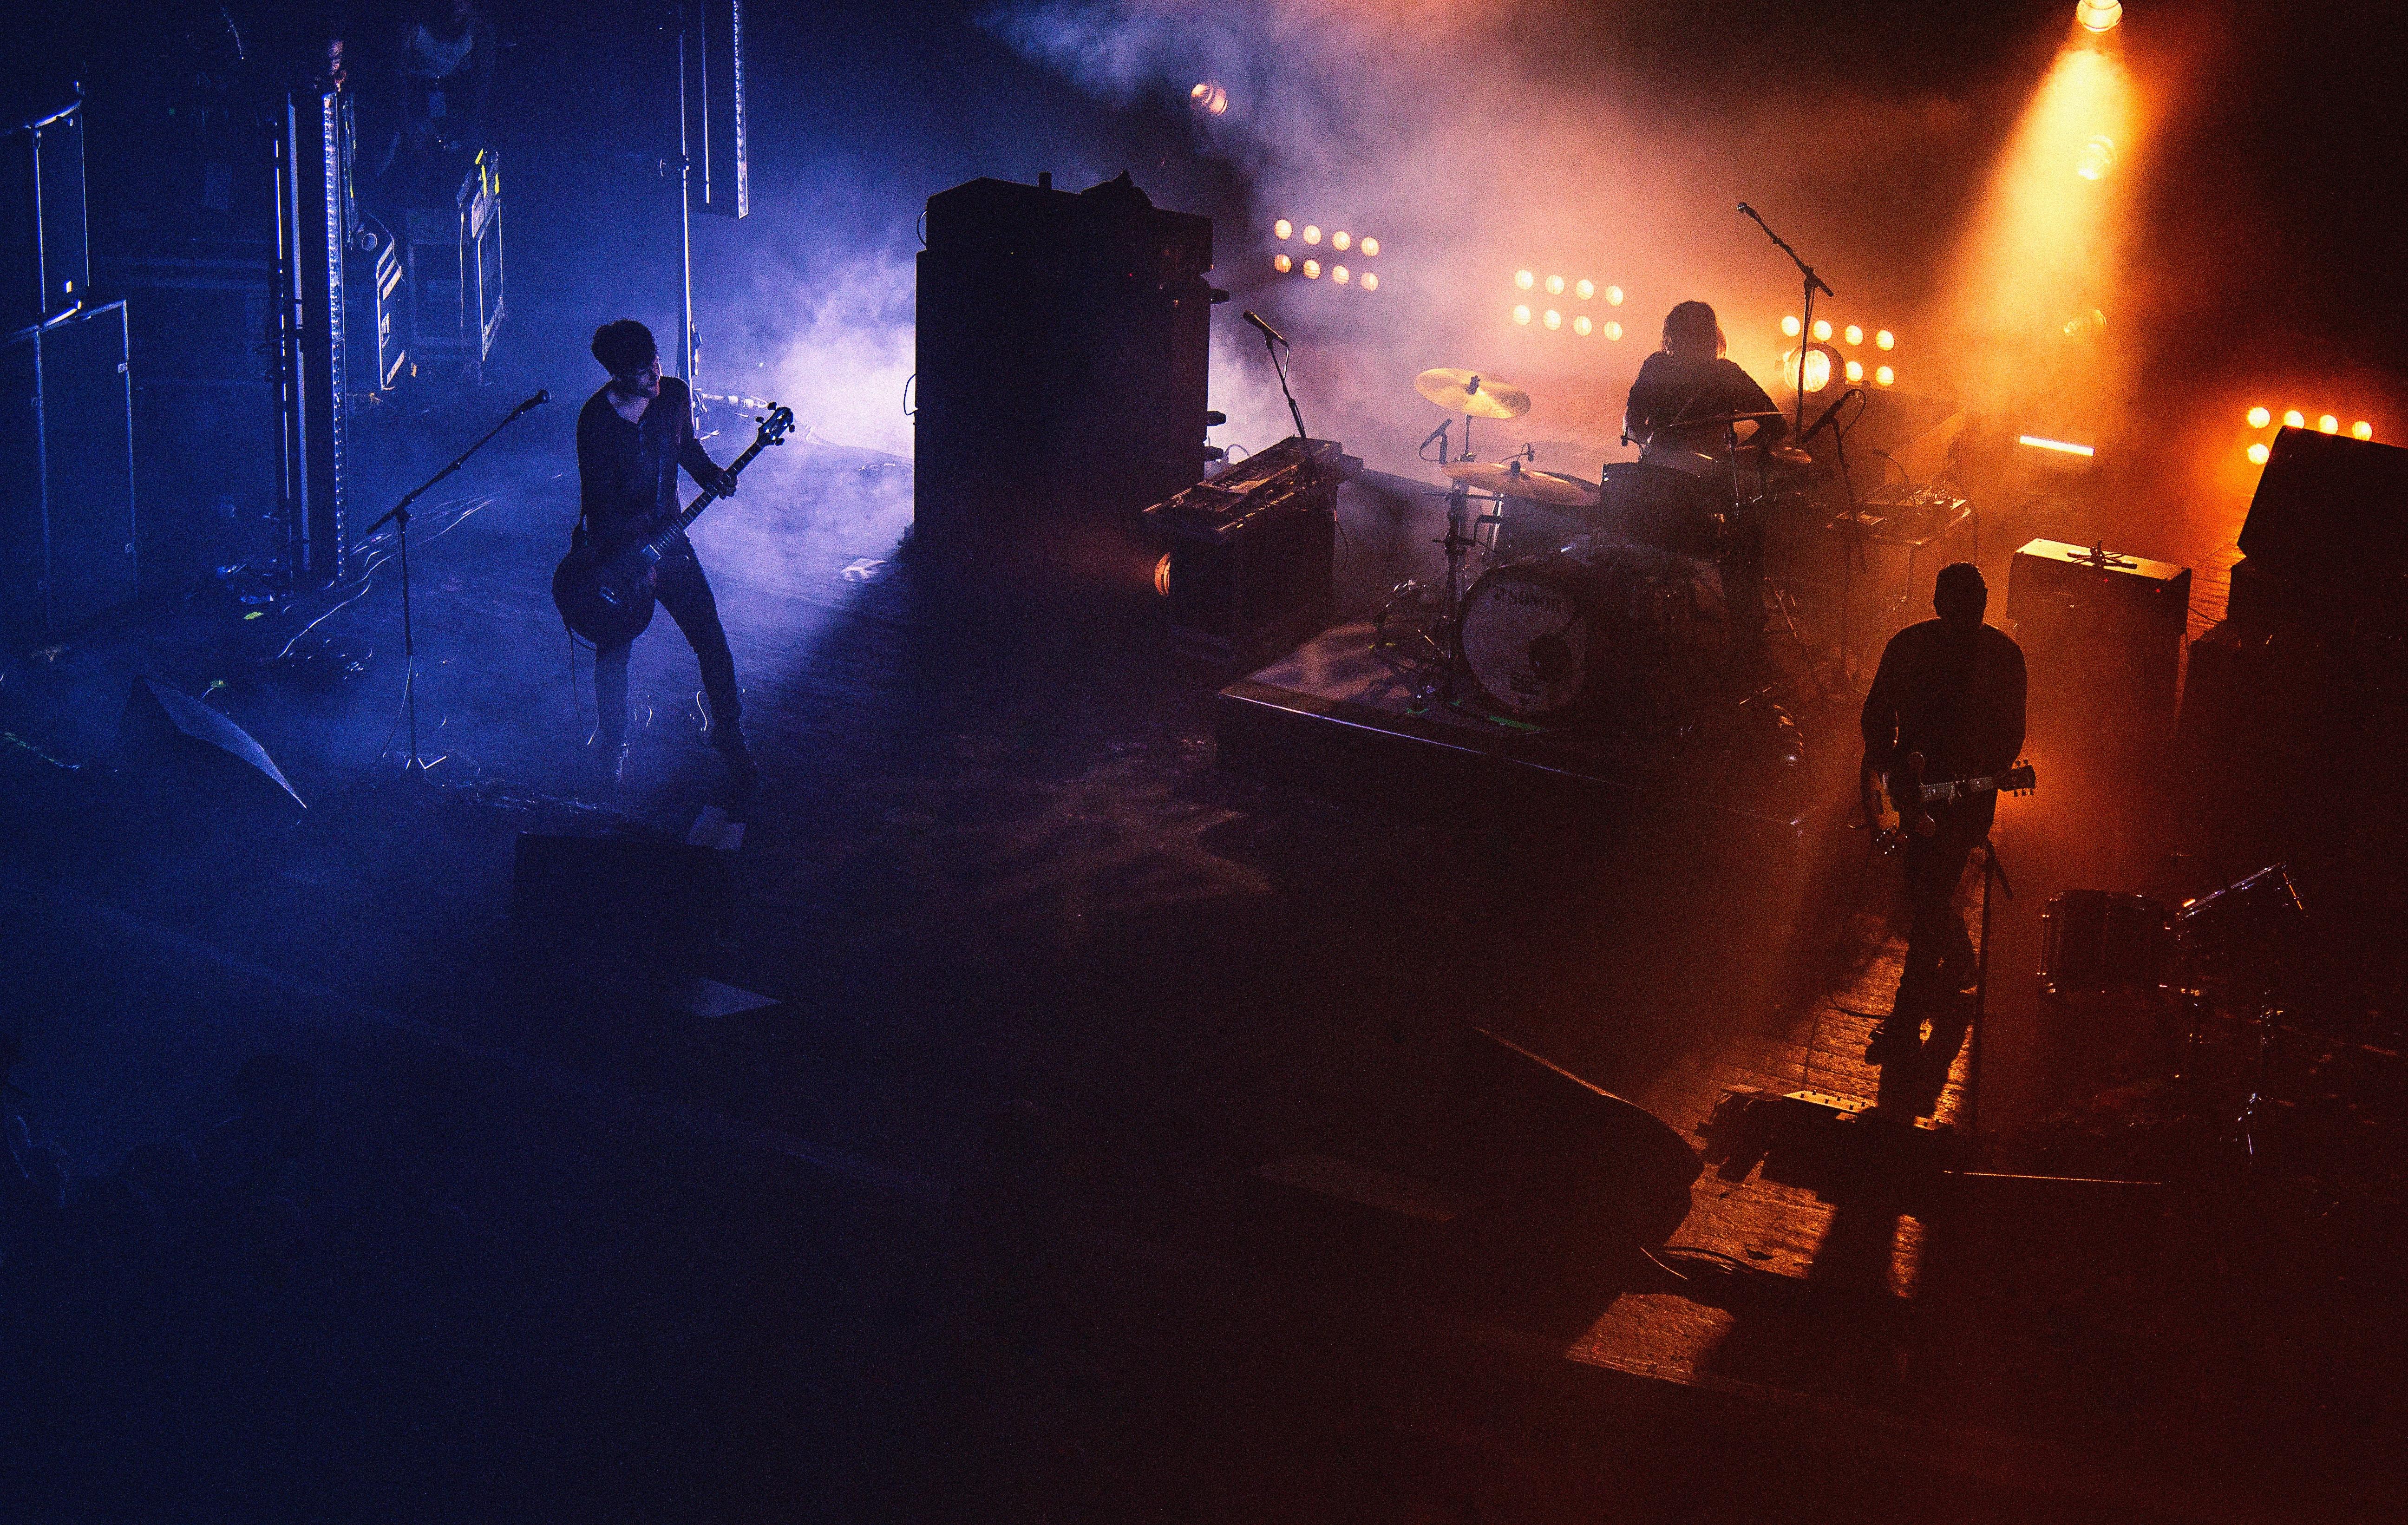 A rock band